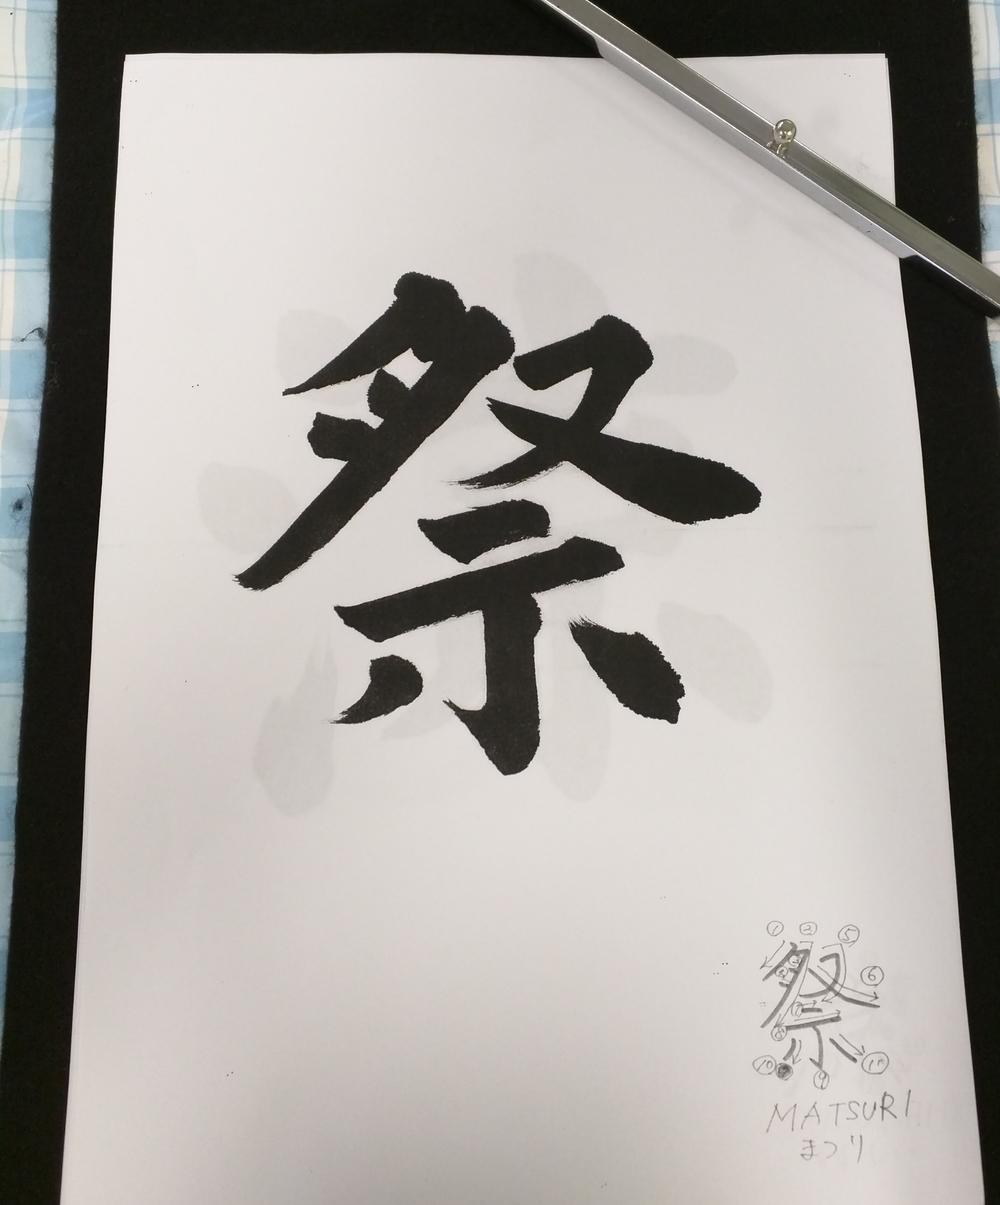 Festival (matsuri)